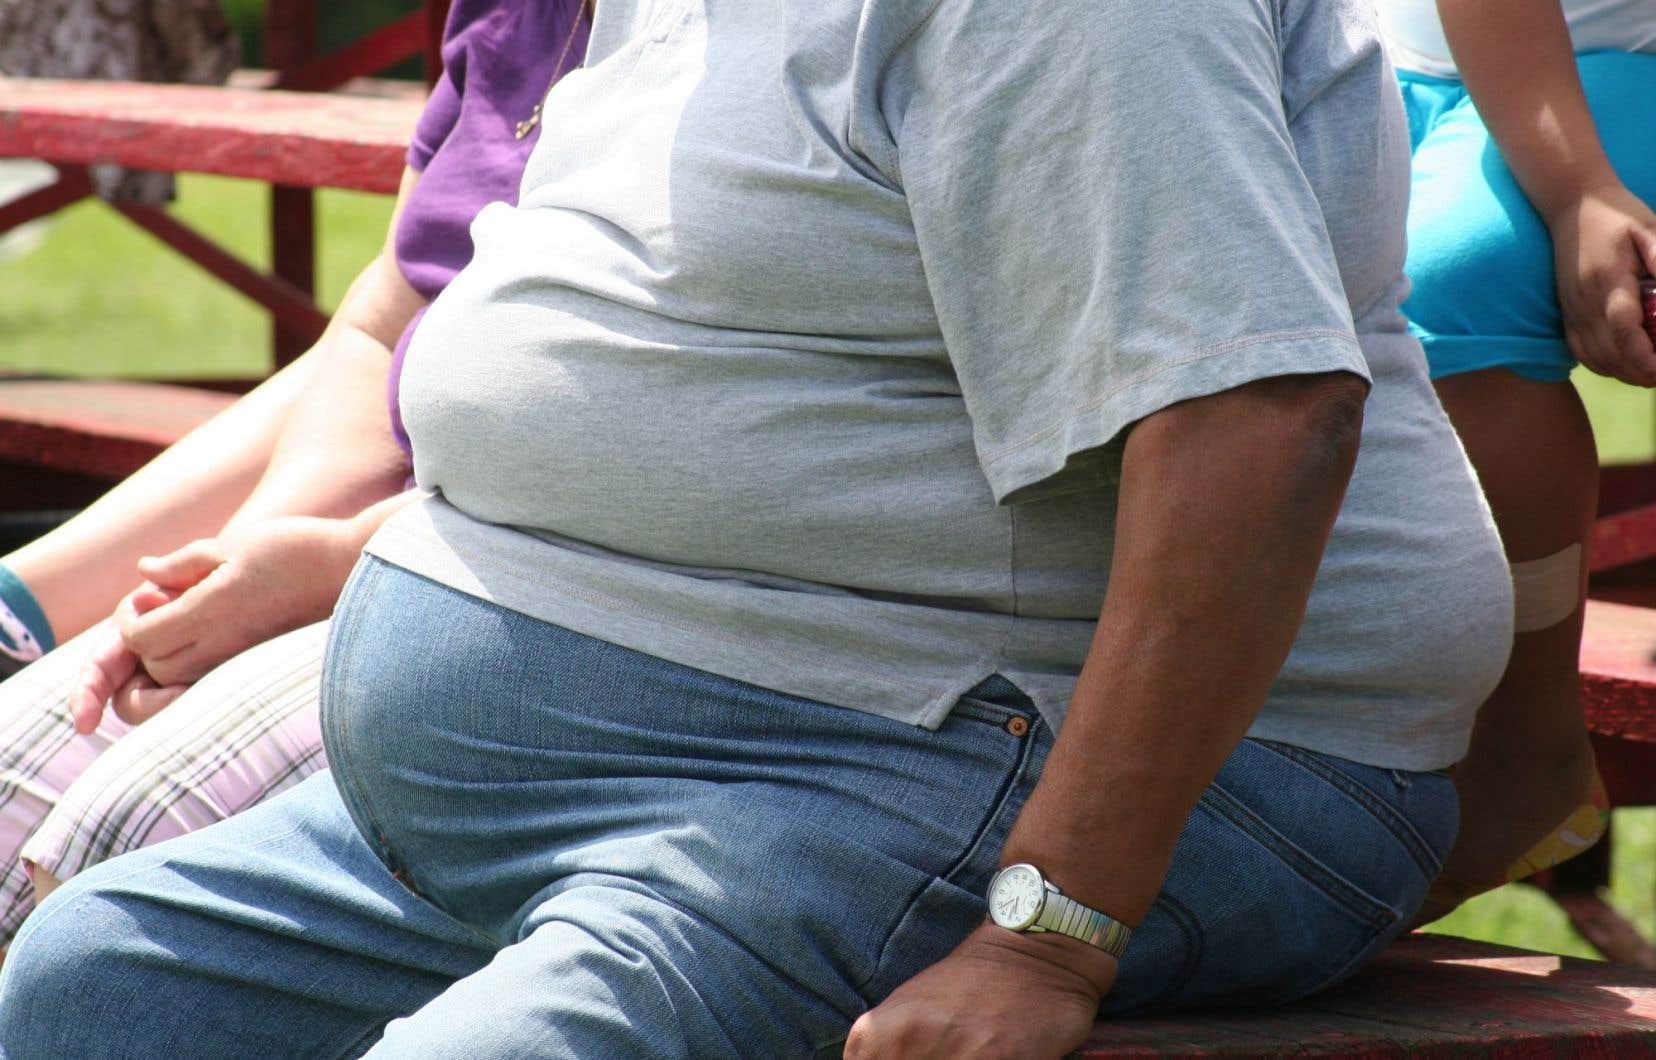 Les préjugés envers les adultes obèses sont malheureusement encore omniprésents.